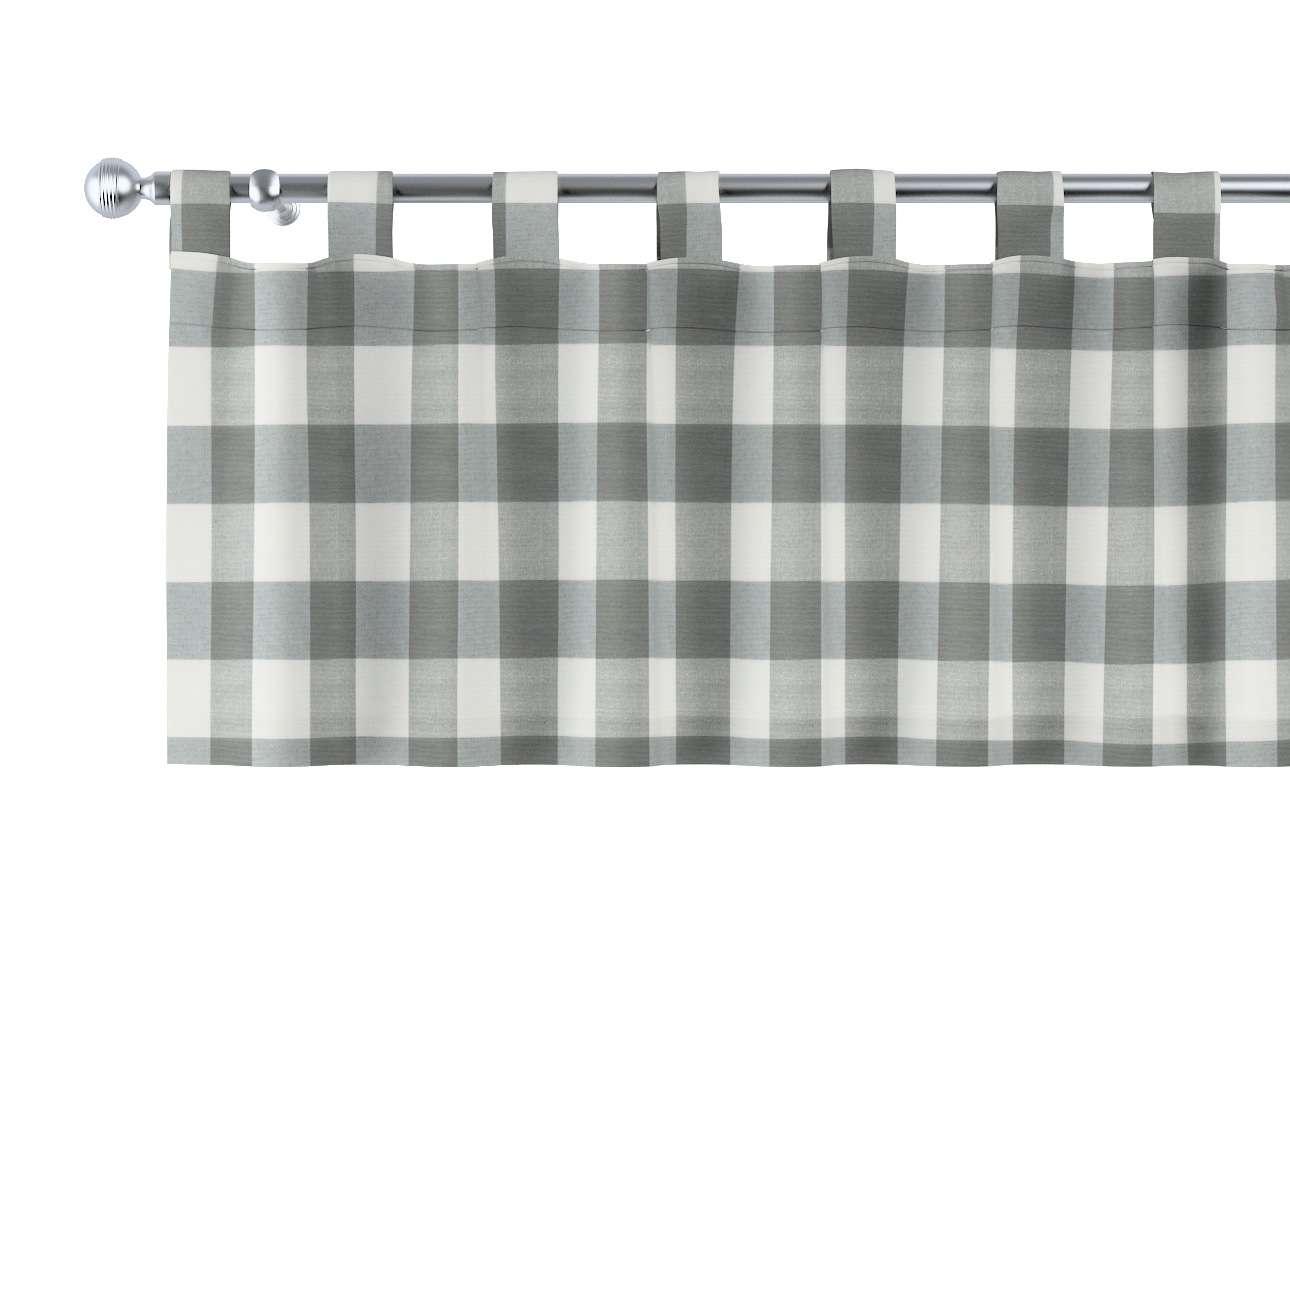 Lambrekin na szelkach 130x40cm w kolekcji Quadro, tkanina: 136-13